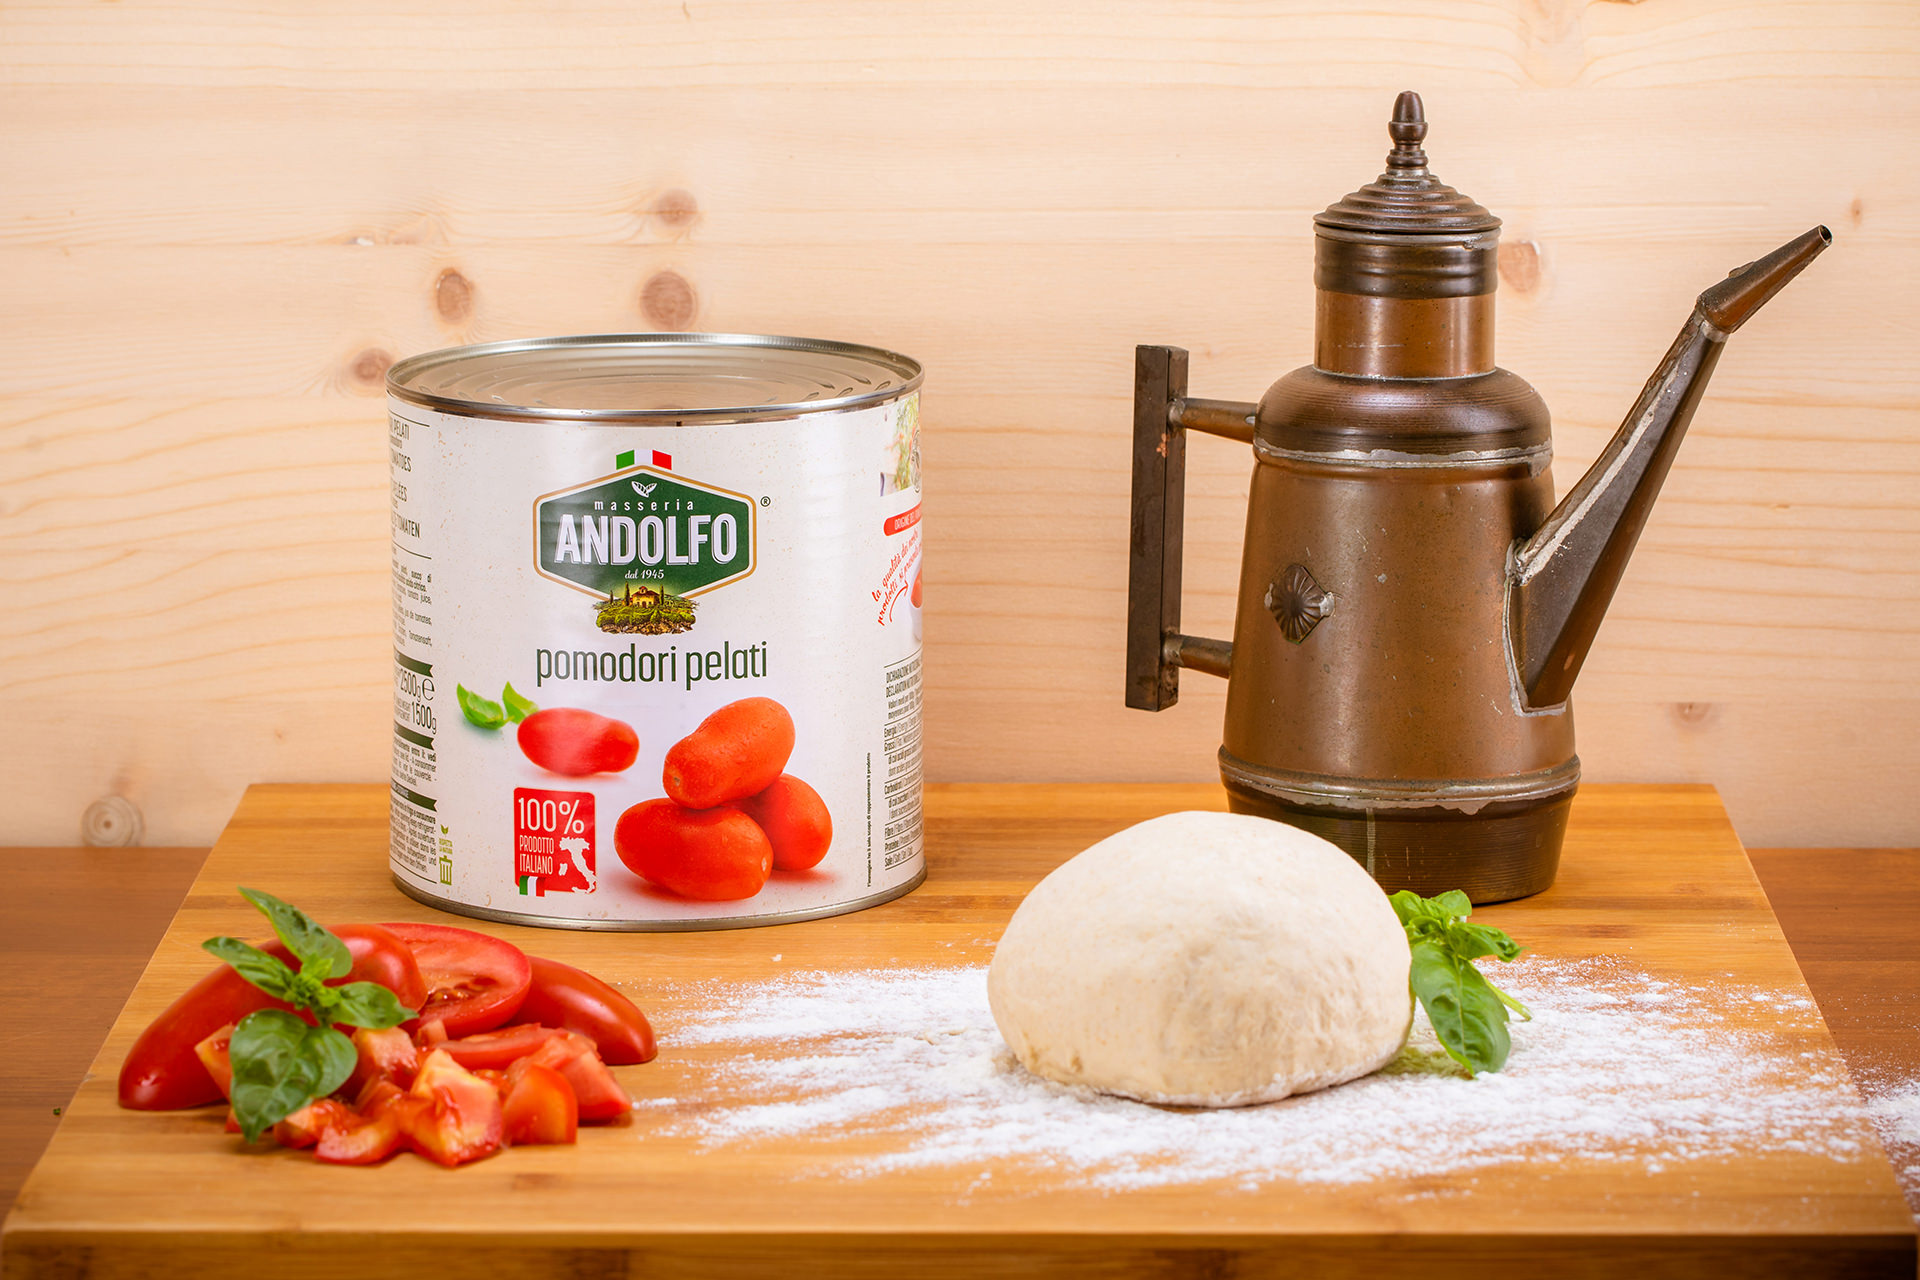 Masseria Andolfo - Food Service Pomodori pelati